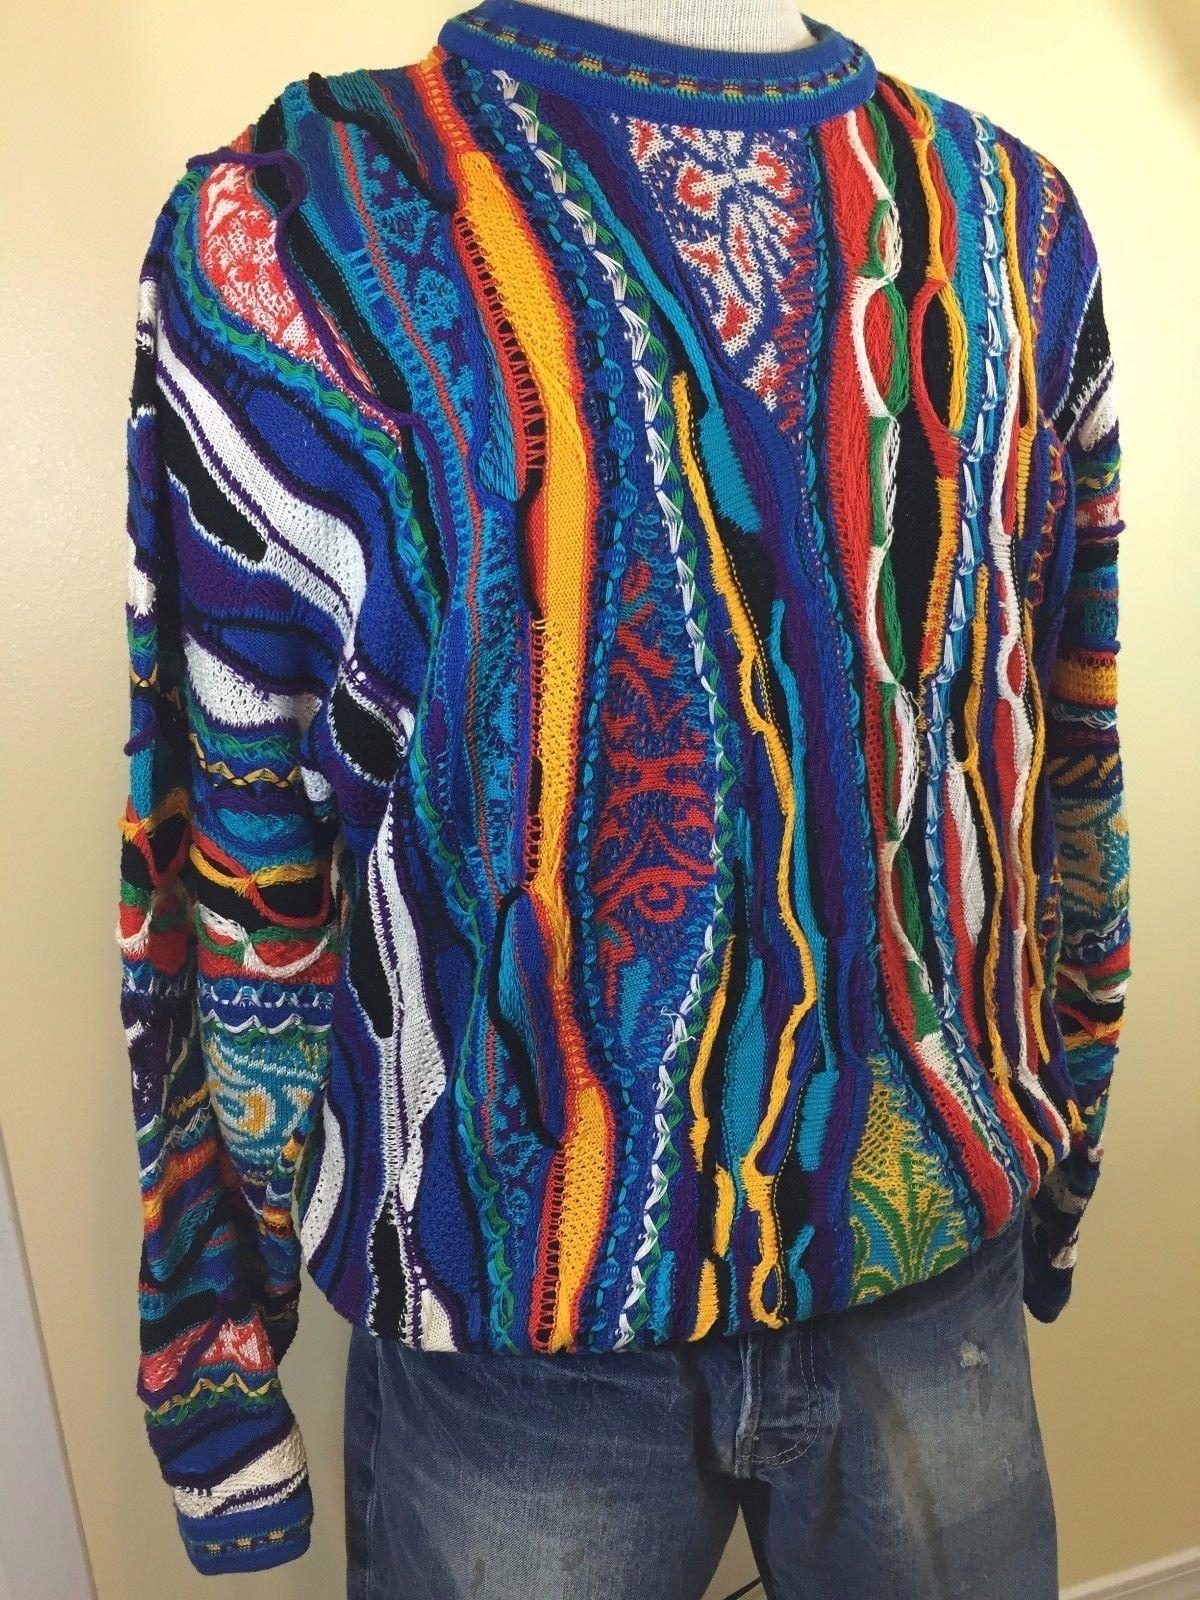 8c779afaf22f Vintage COOGI Mens Mercerized Cotton 3D Colorful Biggie Cosby Sweater  Medium | eBay